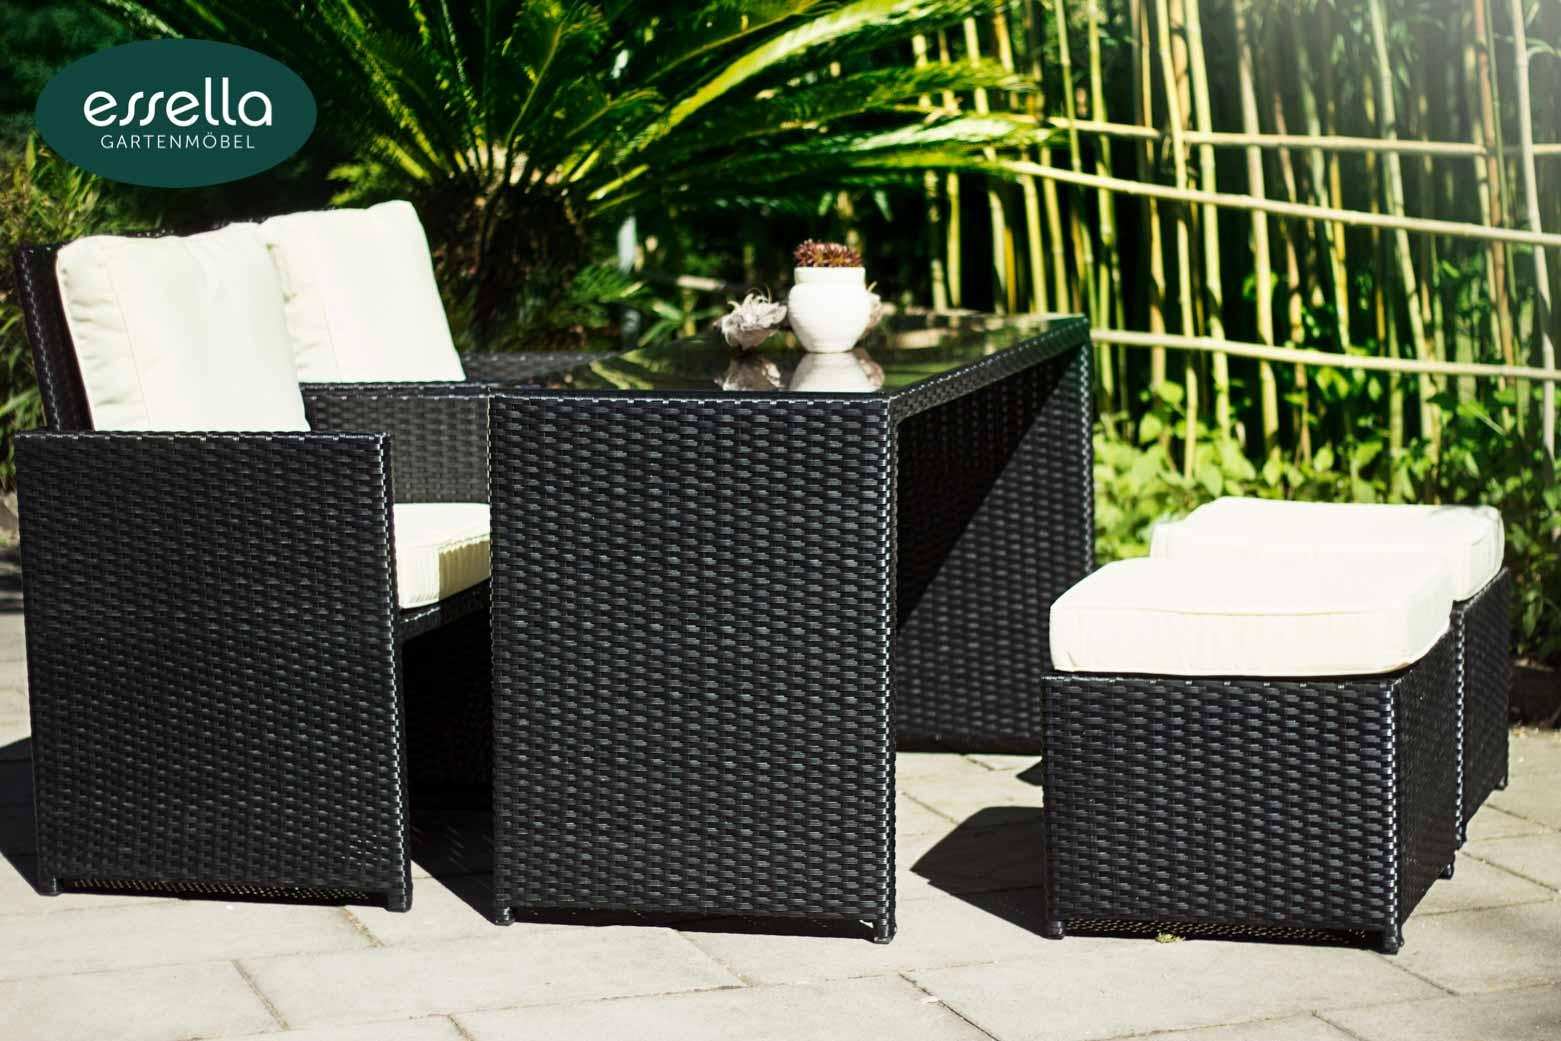 essella polyrattan sitzgruppe vienna 2 personen. Black Bedroom Furniture Sets. Home Design Ideas